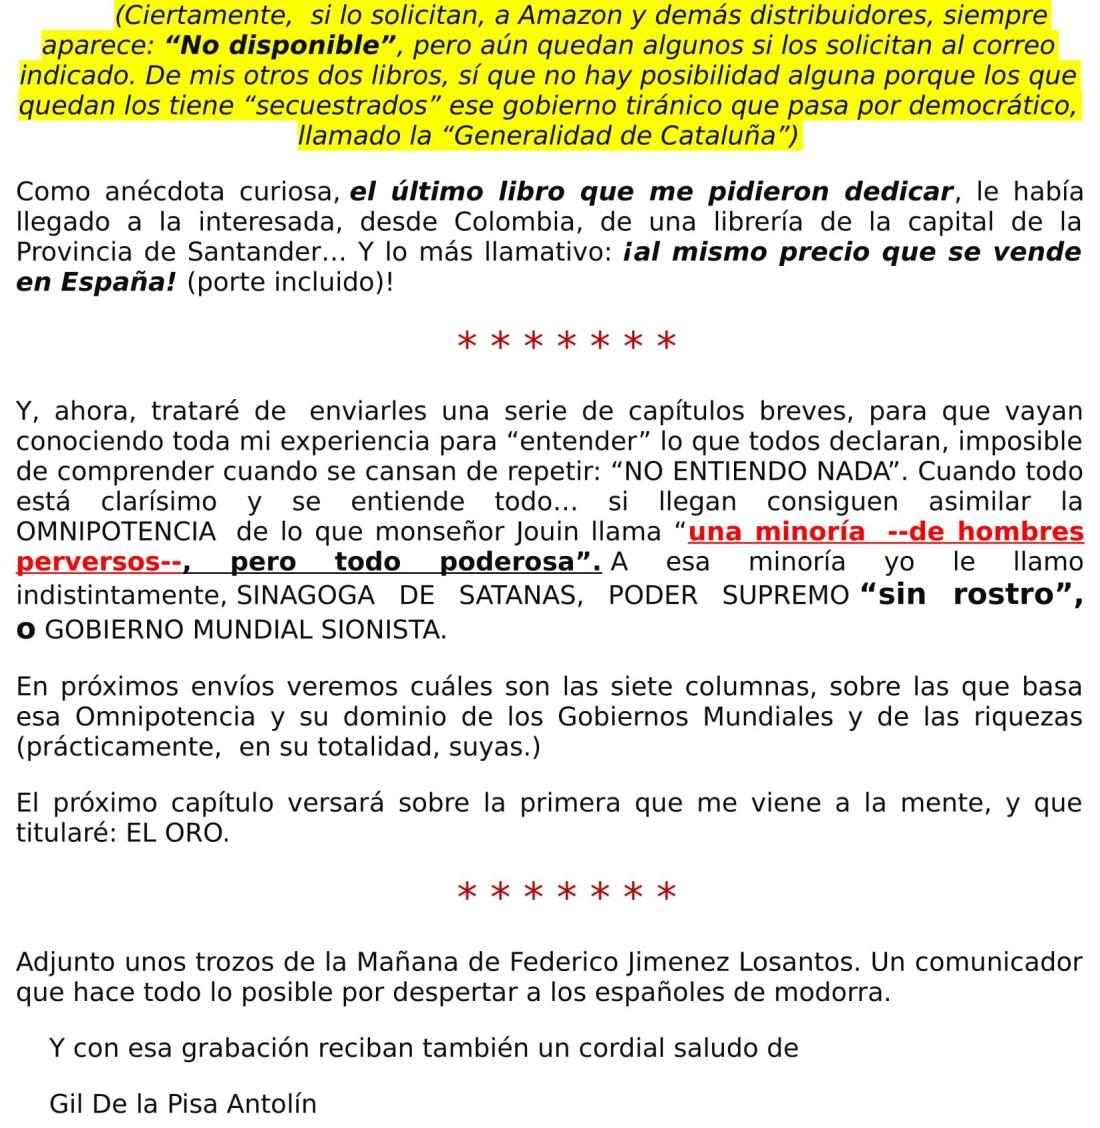 DESCIFRA LO QUE PASA-3